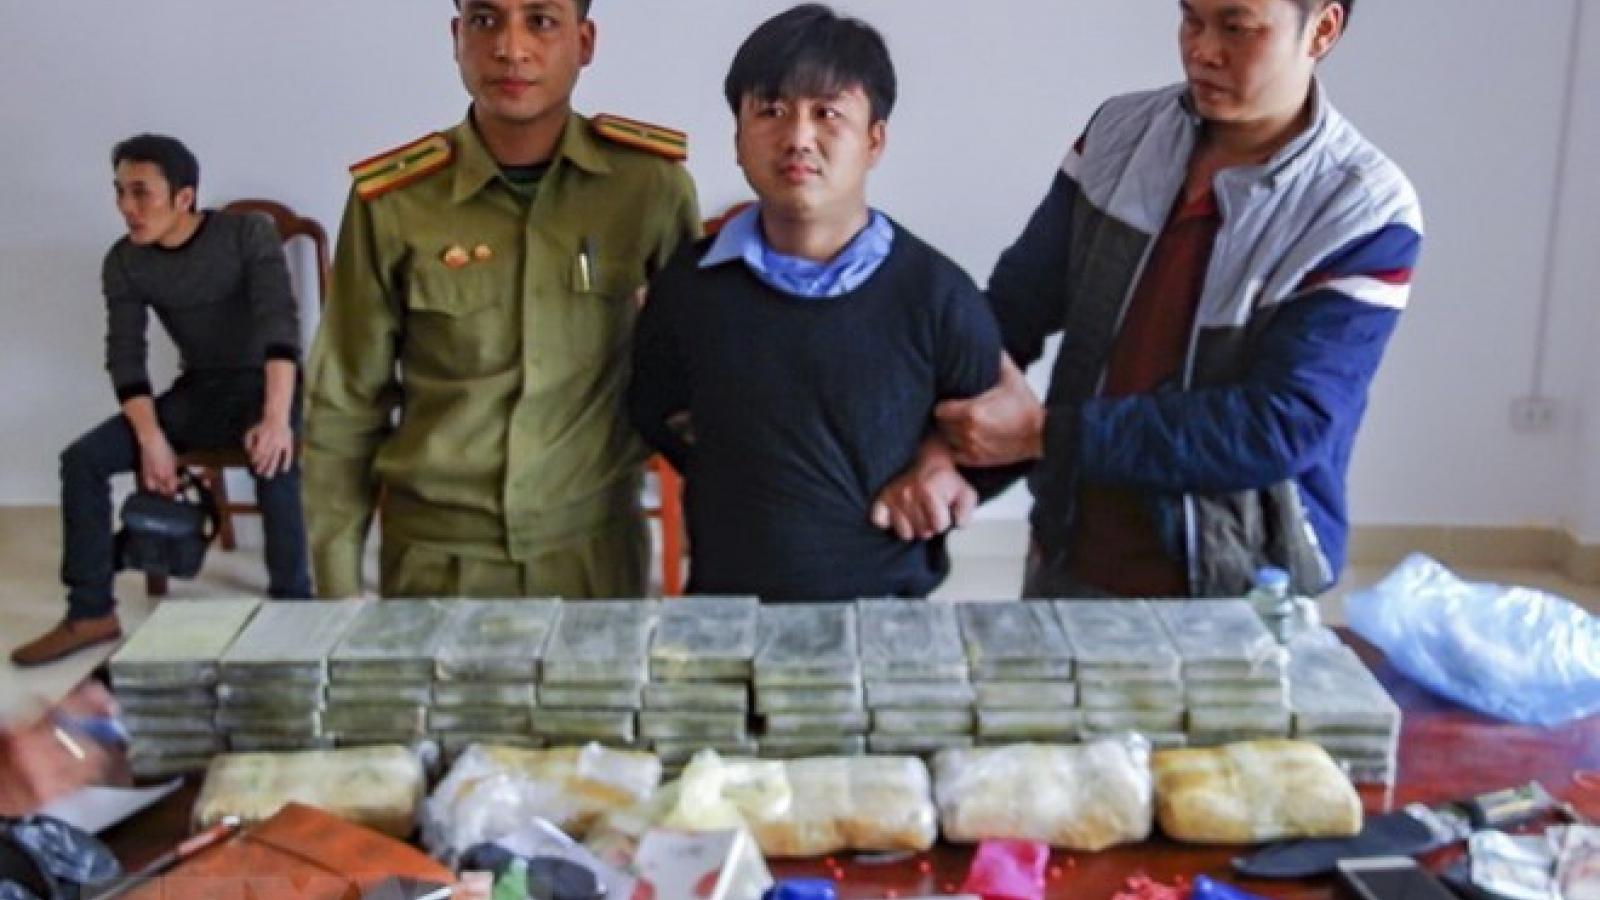 Dien Bien police uncover cross-border drugs trafficking ring